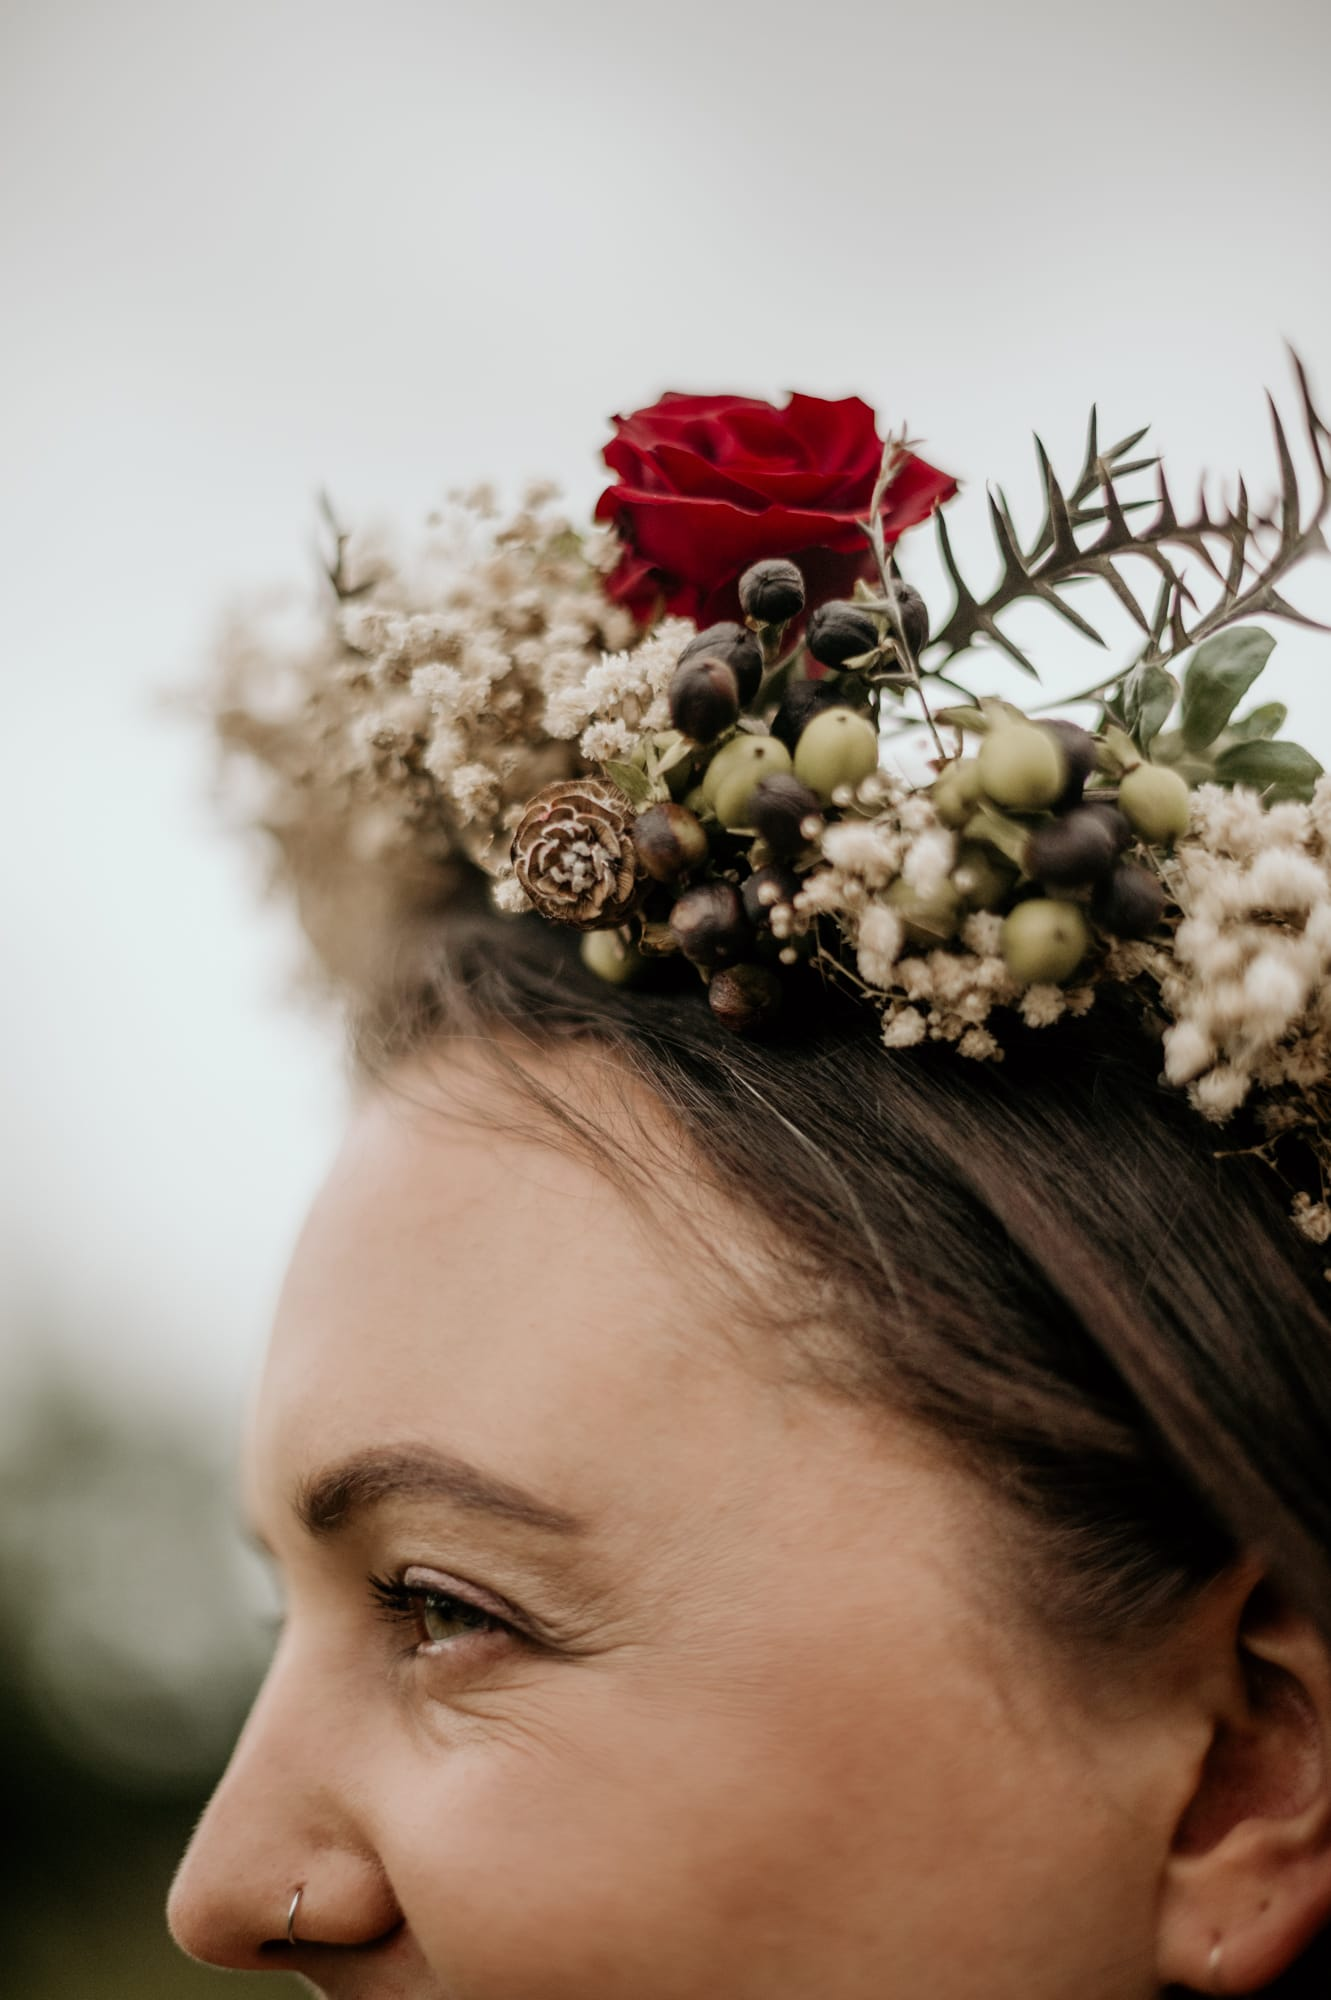 wesley-lanie-george-fernridge-engagement-June-Richards-Photography-Destination-Weddings-Elopements-Garden-Route-11